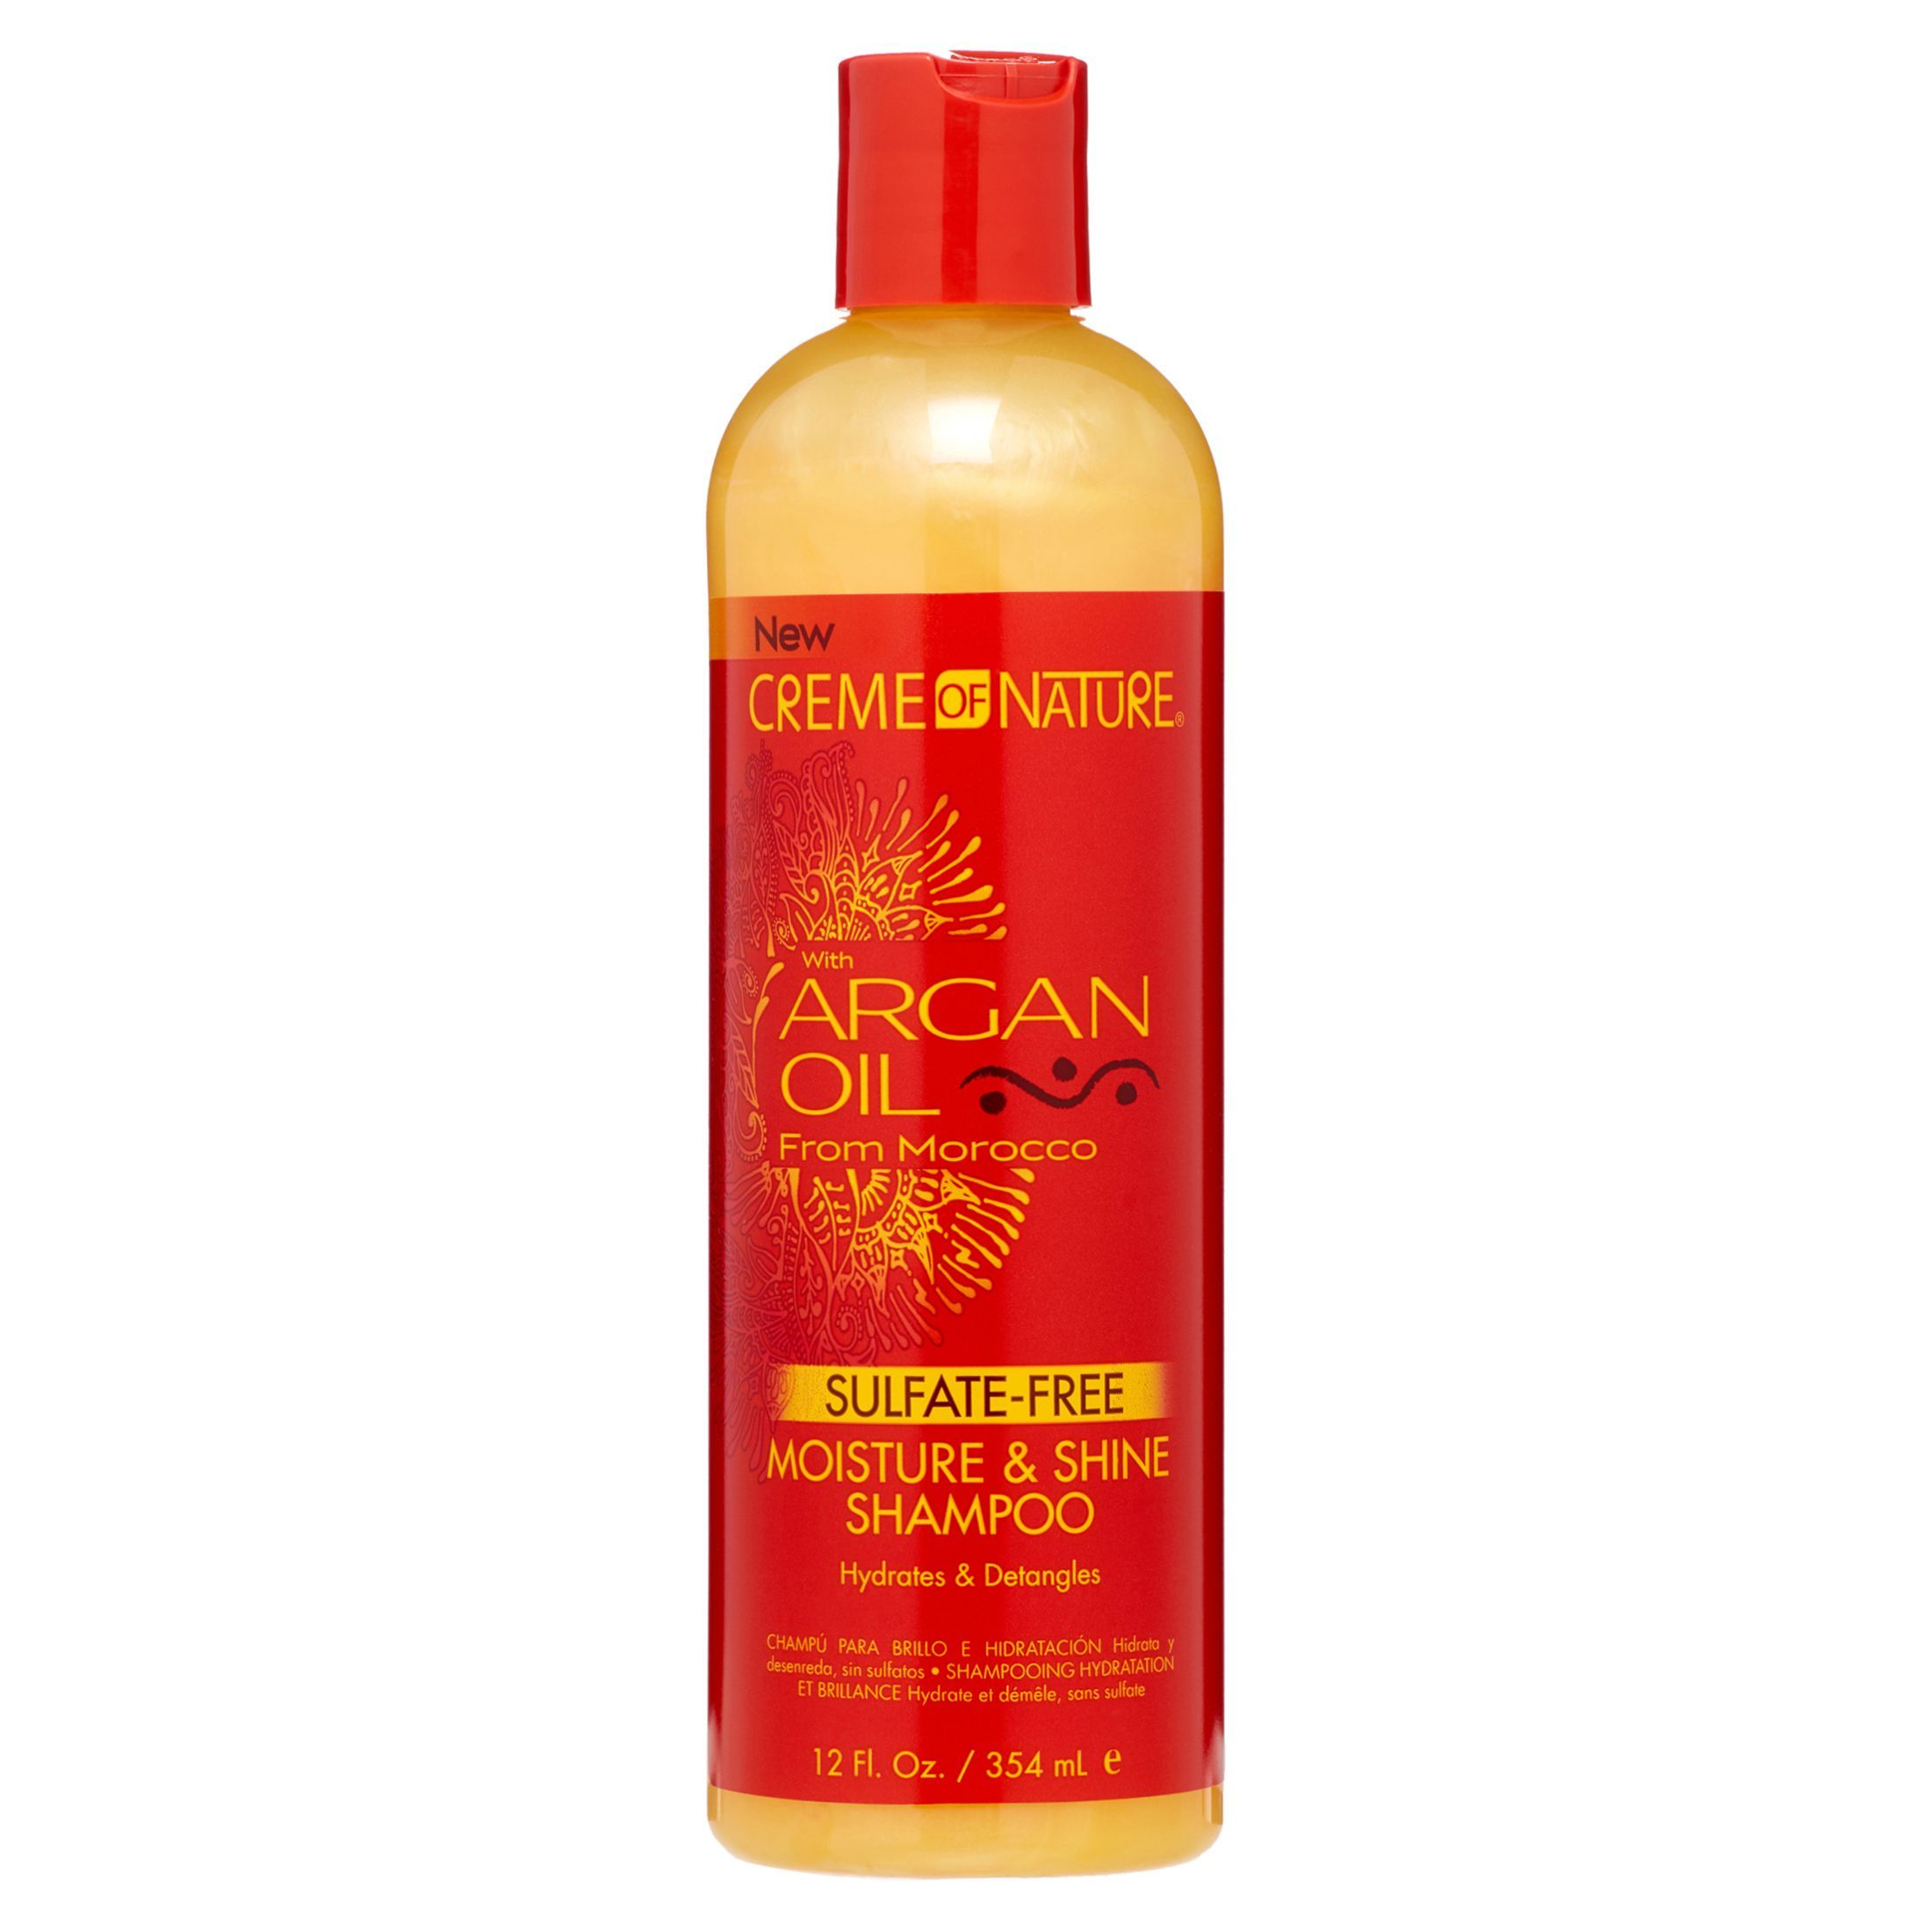 Creme Of Nature Argan Oil Moisture & Shine Shampoo - 355ml